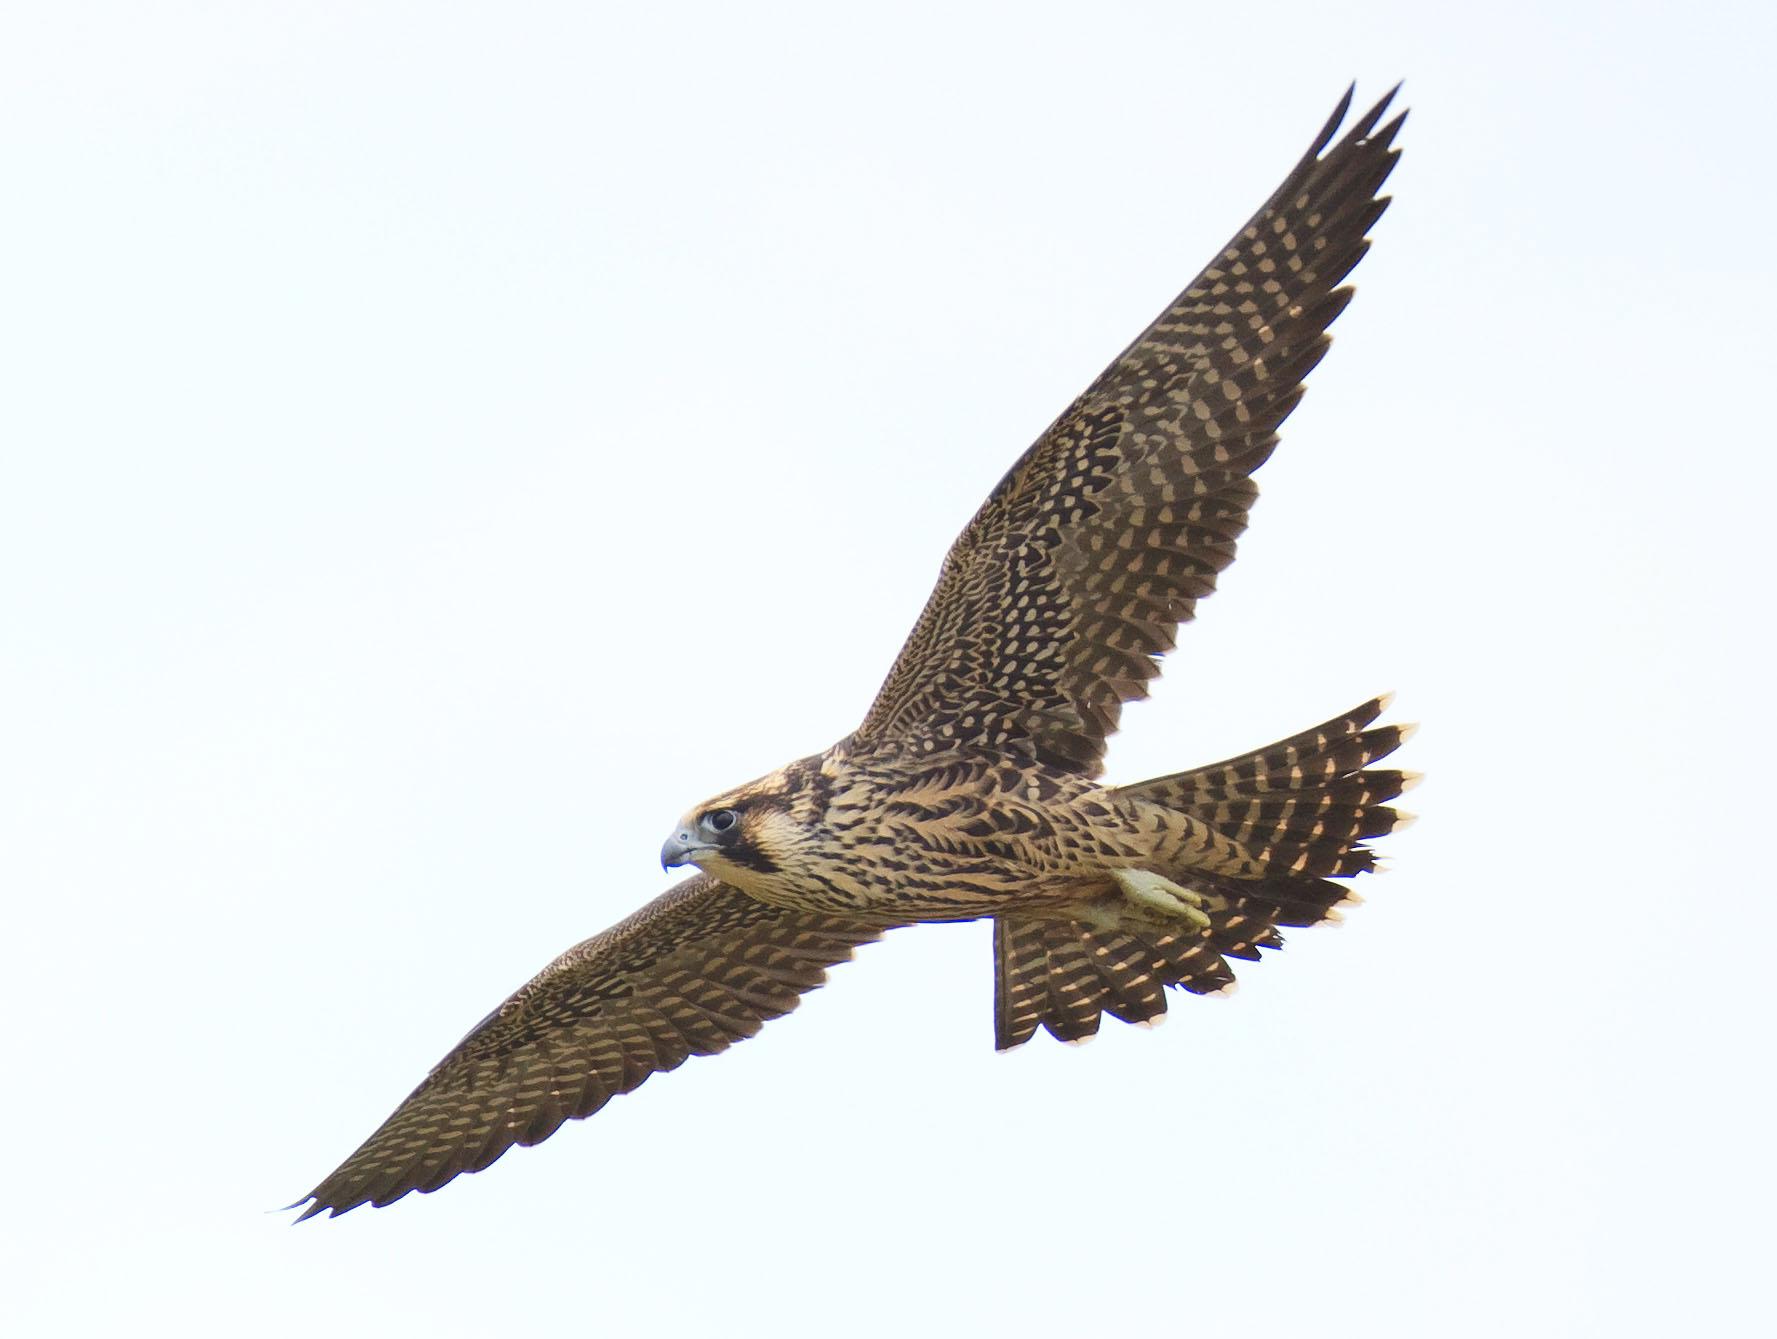 peregrine falcon photographed at curry hammock state park by kevan sunderland  peregrine falcon update  u2013 october 20 2013   florida keys hawkwatch  rh   floridakeyshawkwatch wordpress